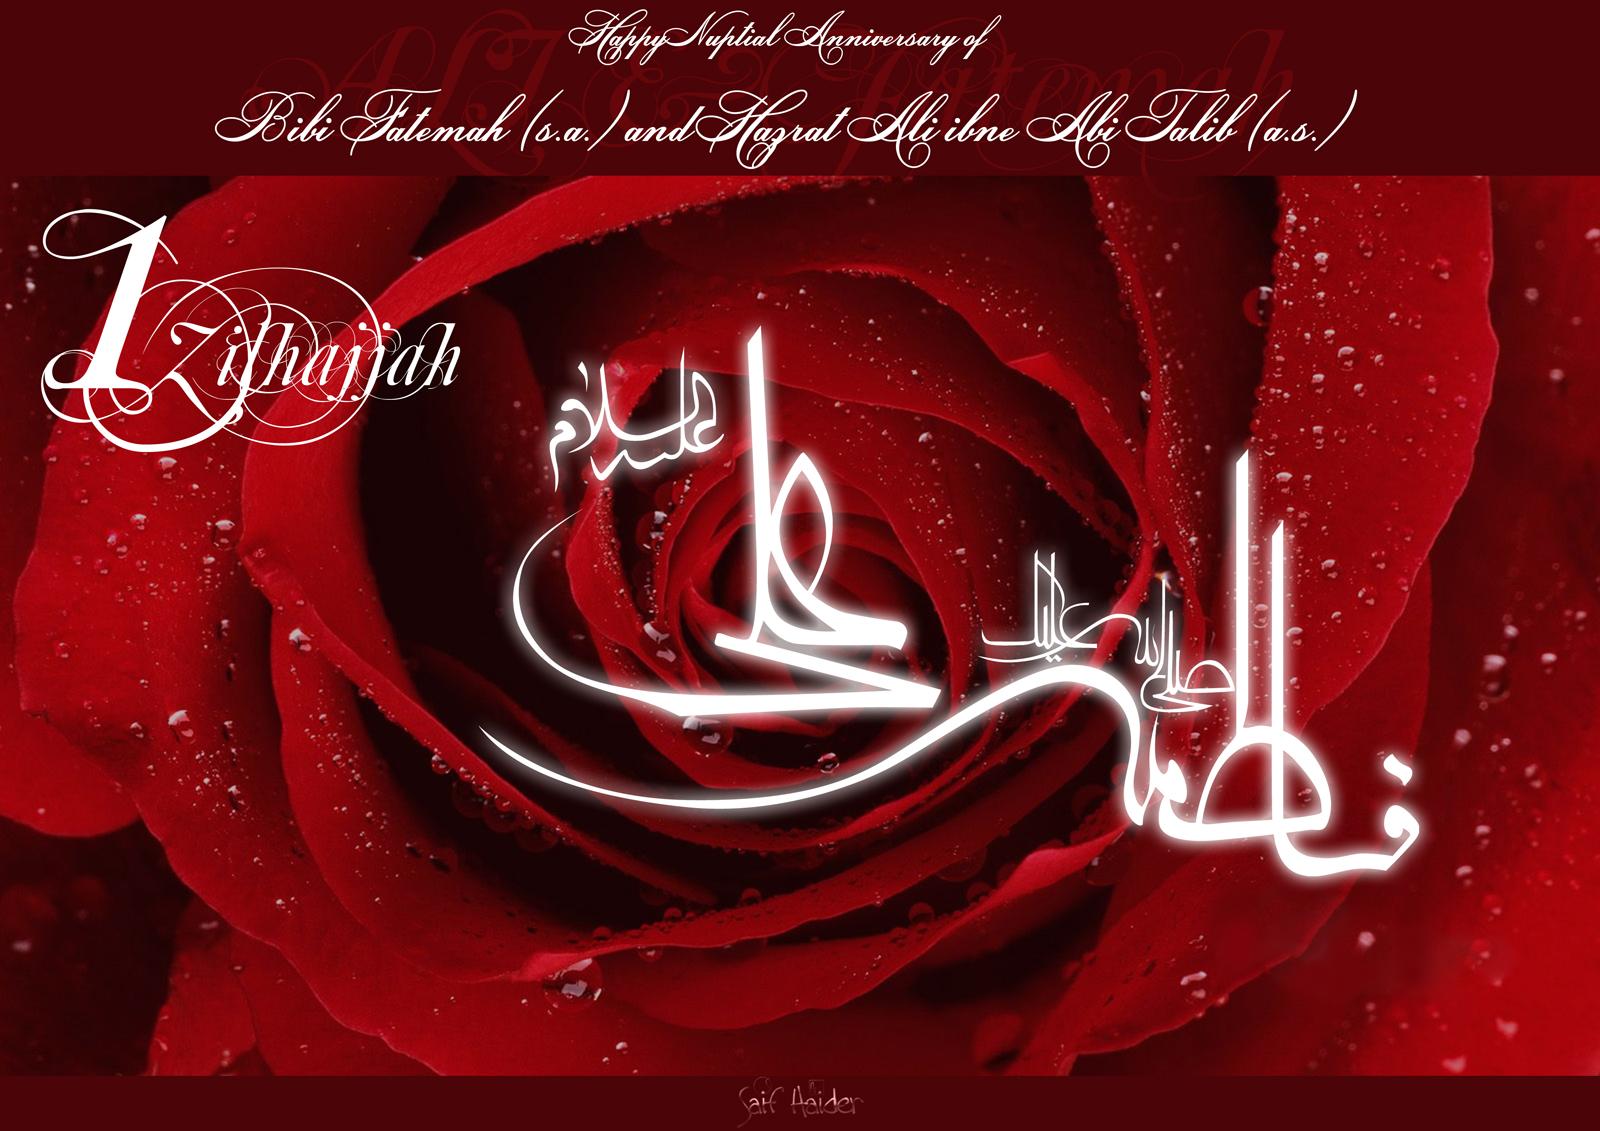 http://1.bp.blogspot.com/_f-aG7DSYngU/TS1sjCJVKHI/AAAAAAAAABY/w4-35DwoyJY/s1600/Bibi+Fatemah+and+H+Ali_LR.jpg